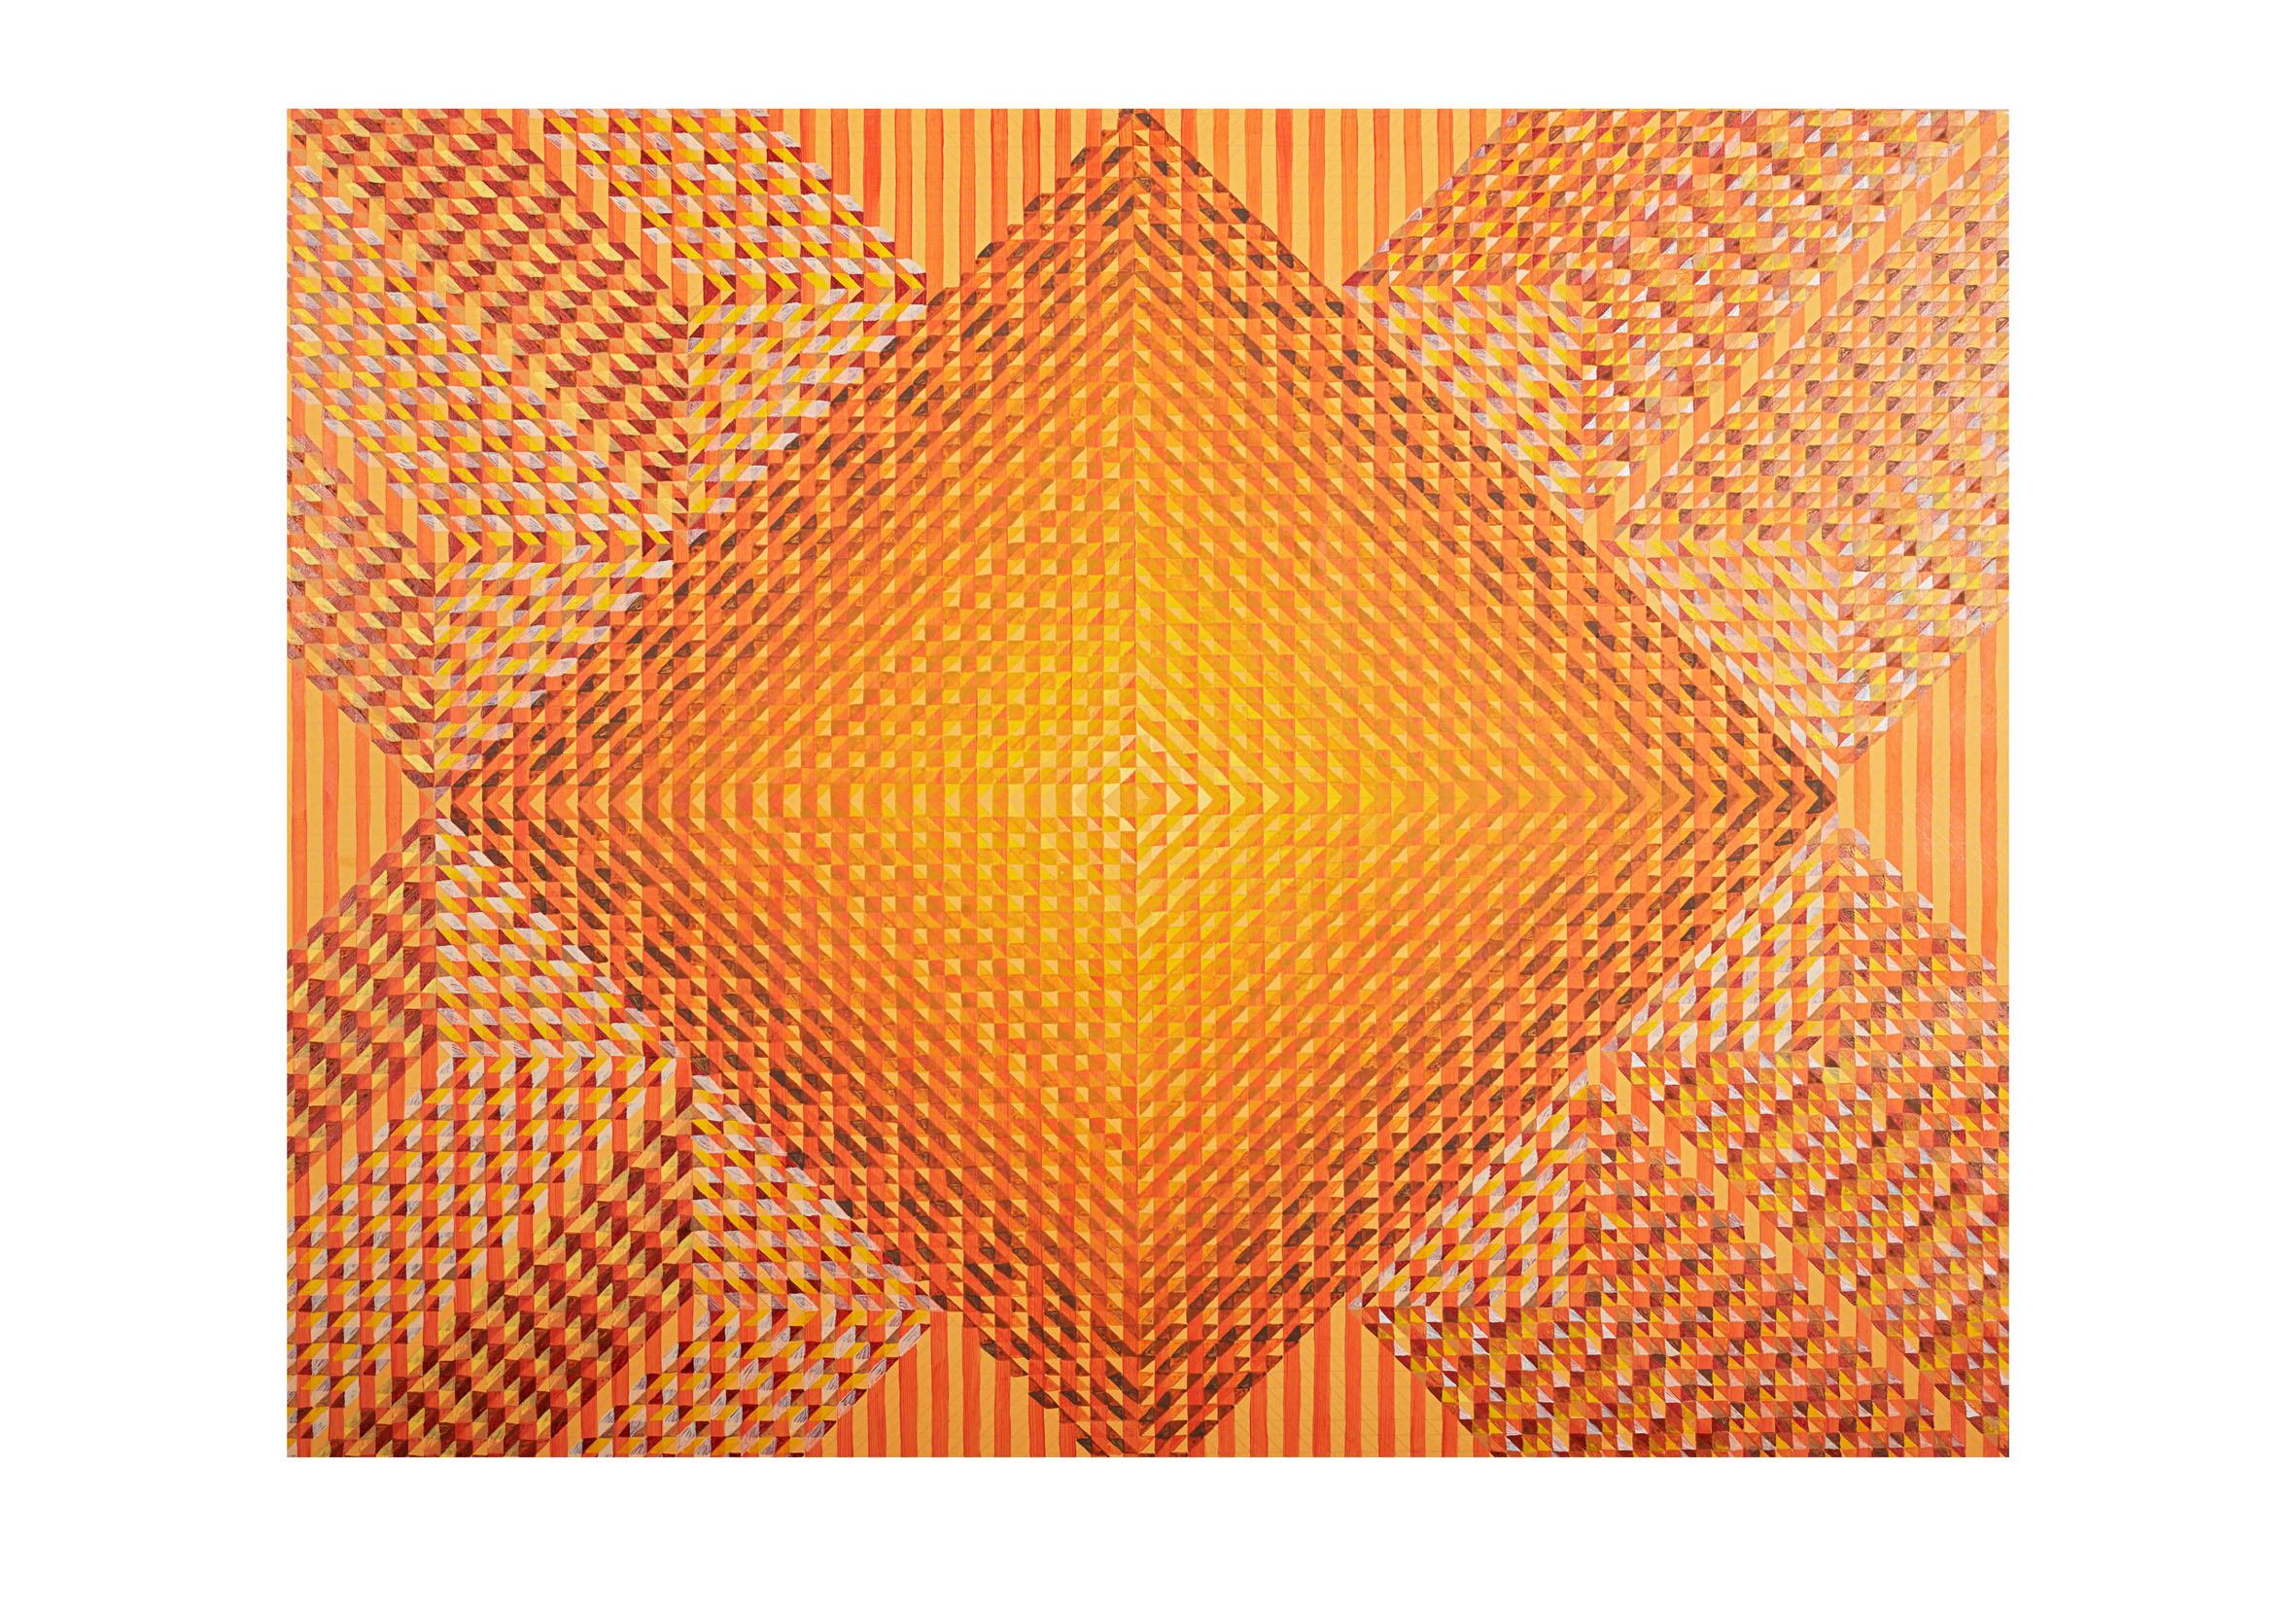 1. Sun Matrix, 1977, New York. (image size 75cm wide x 58.72.cm tall)£500